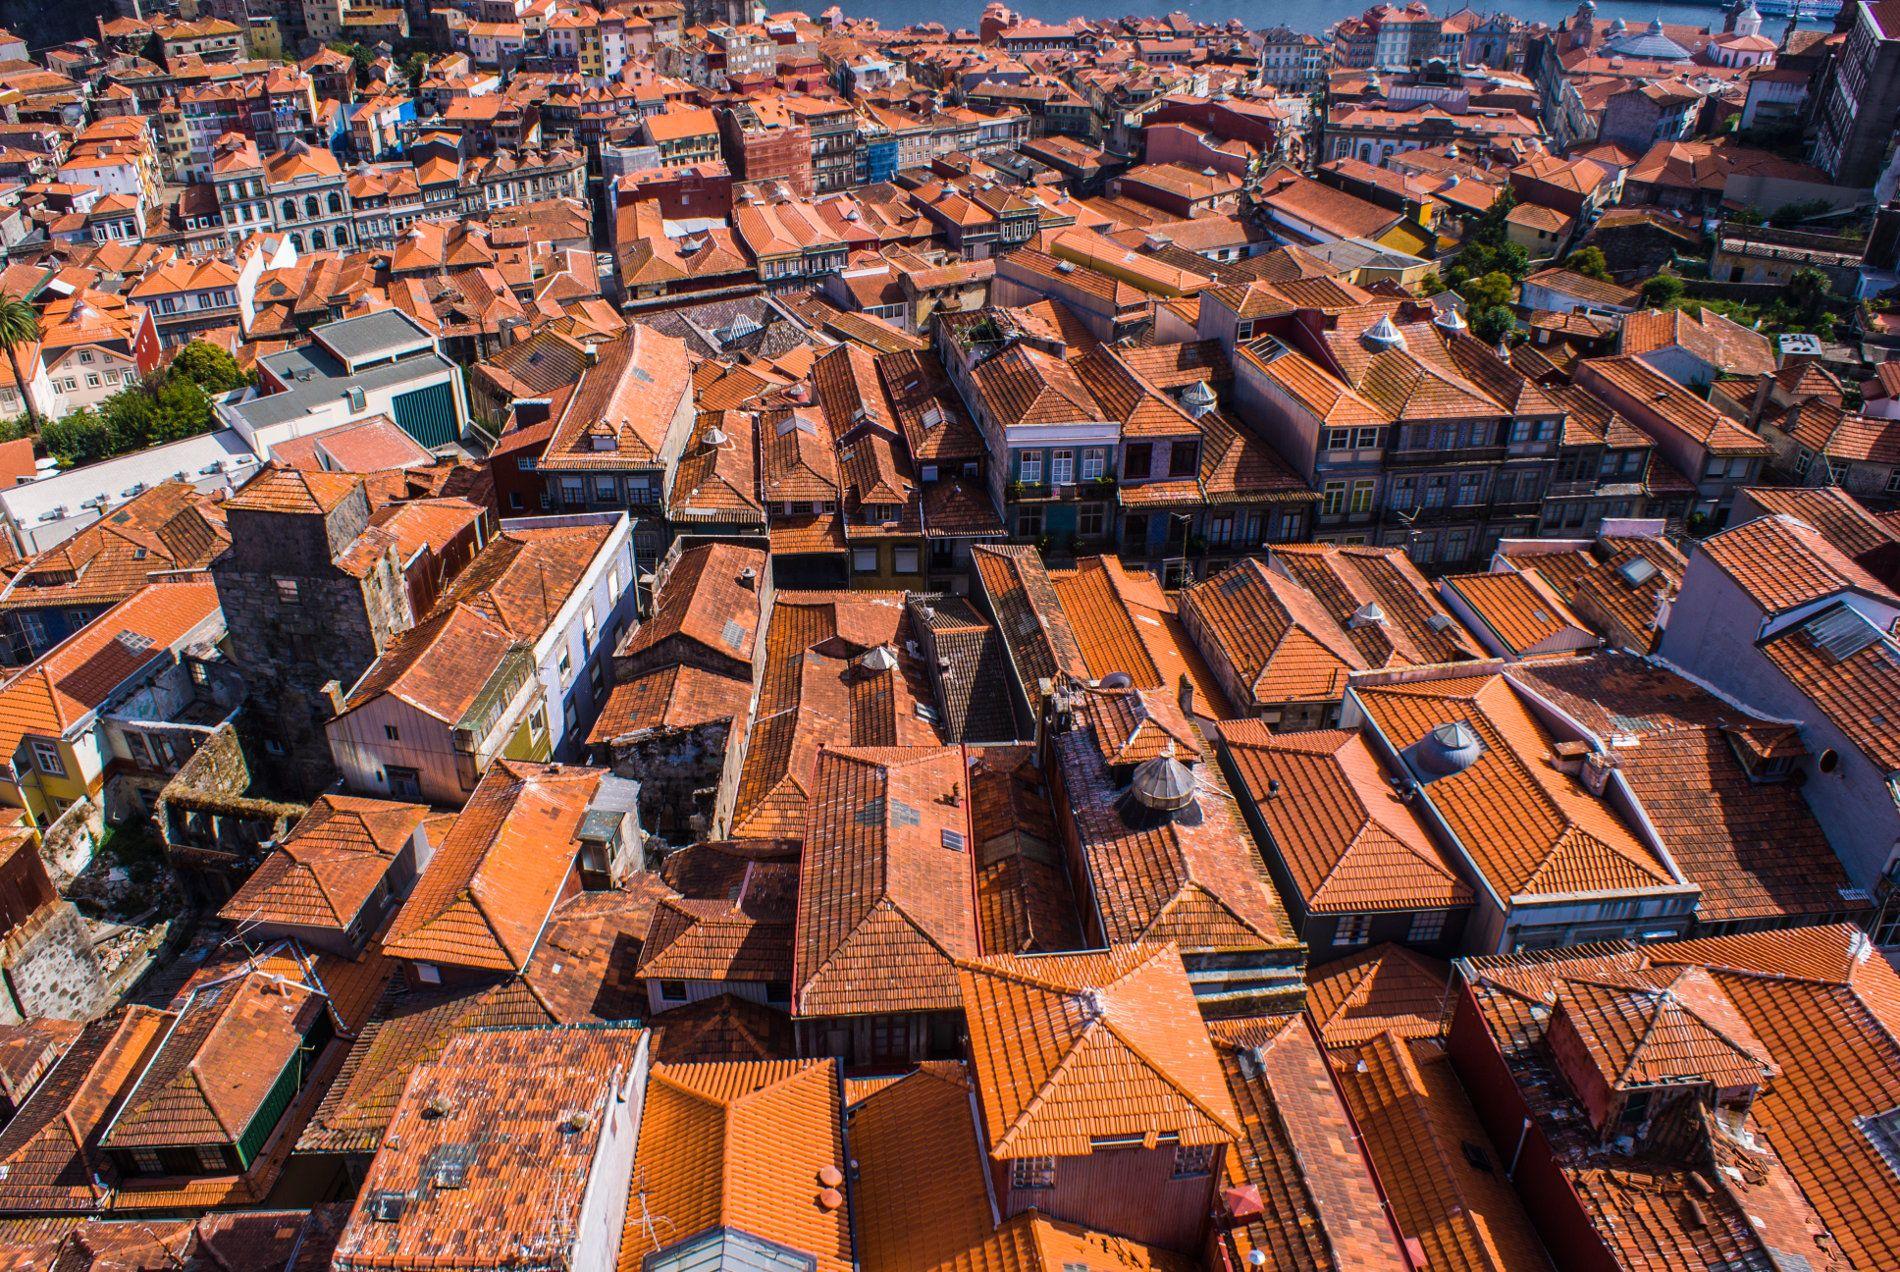 Tailor Made - Porto TourTailor Made - Porto TourTailor Made - Porto TourA Medida - Porto TourFet a mida - Porto Tour - THE CITY TAILORS